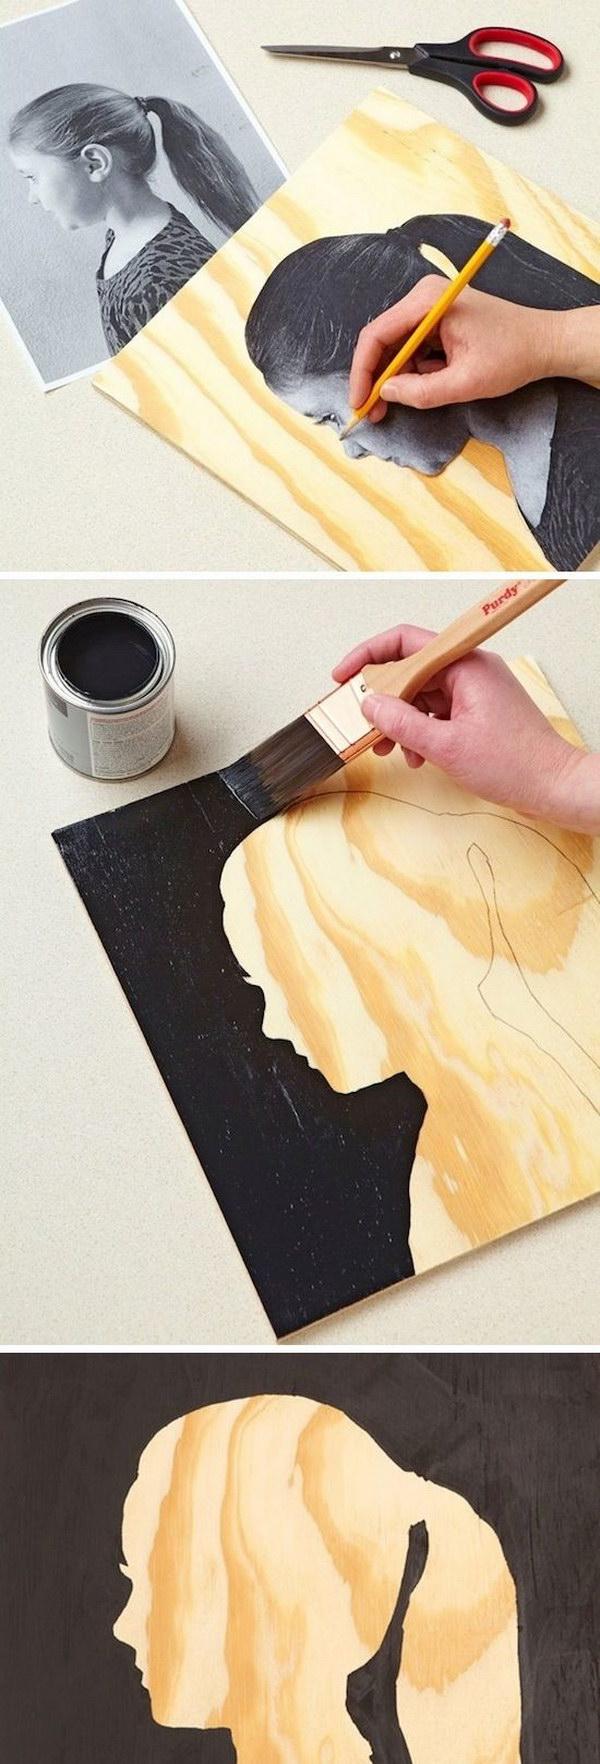 30 Awesome Wall Art Ideas & Tutorials - Hative